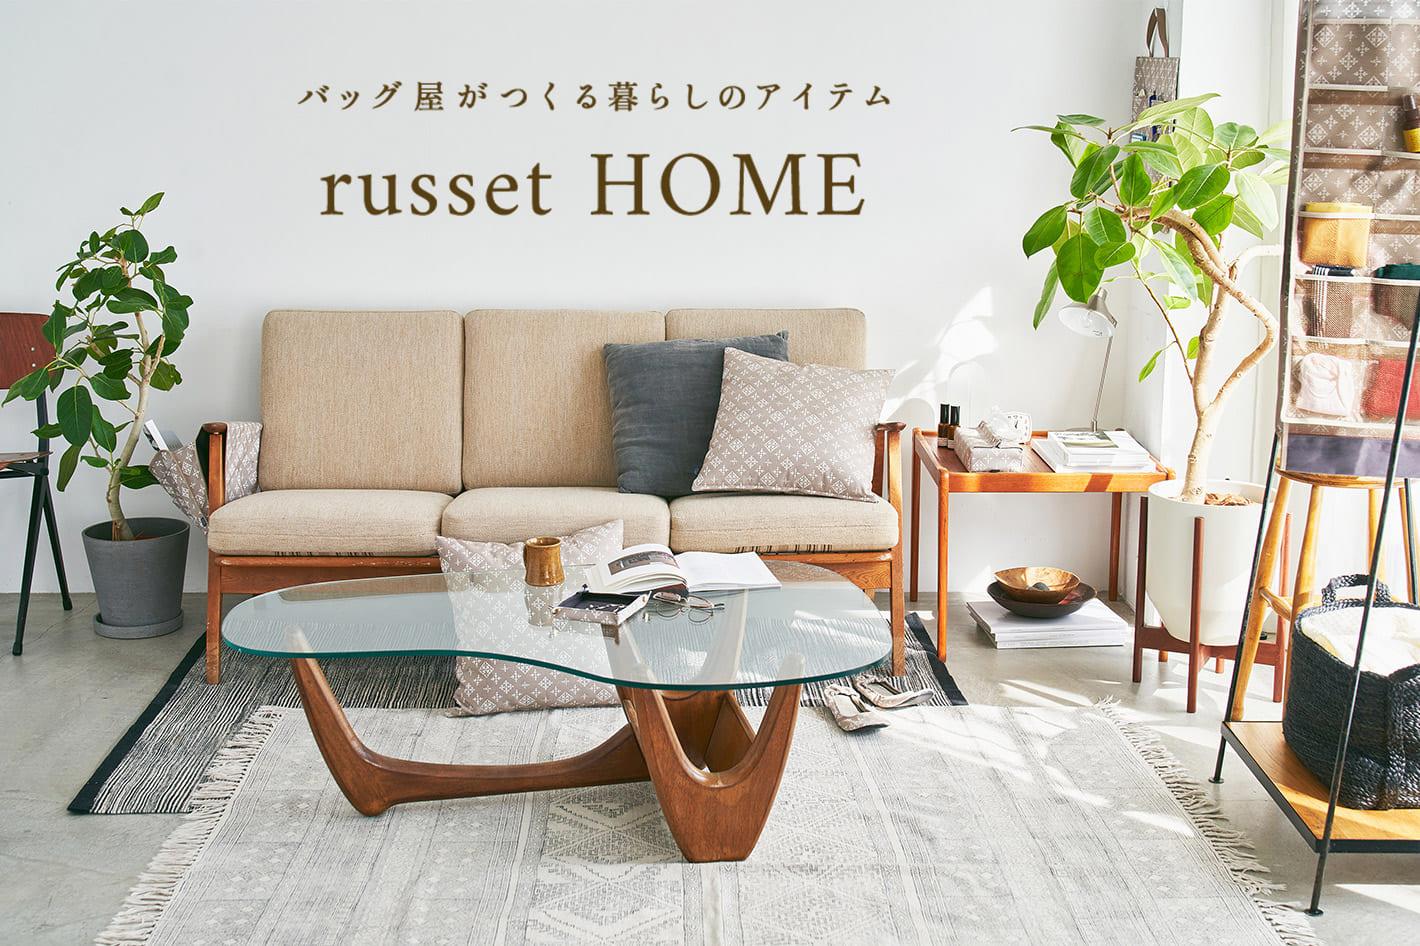 russet russet HOME -バッグ屋がつくる暮らしのアイテム-